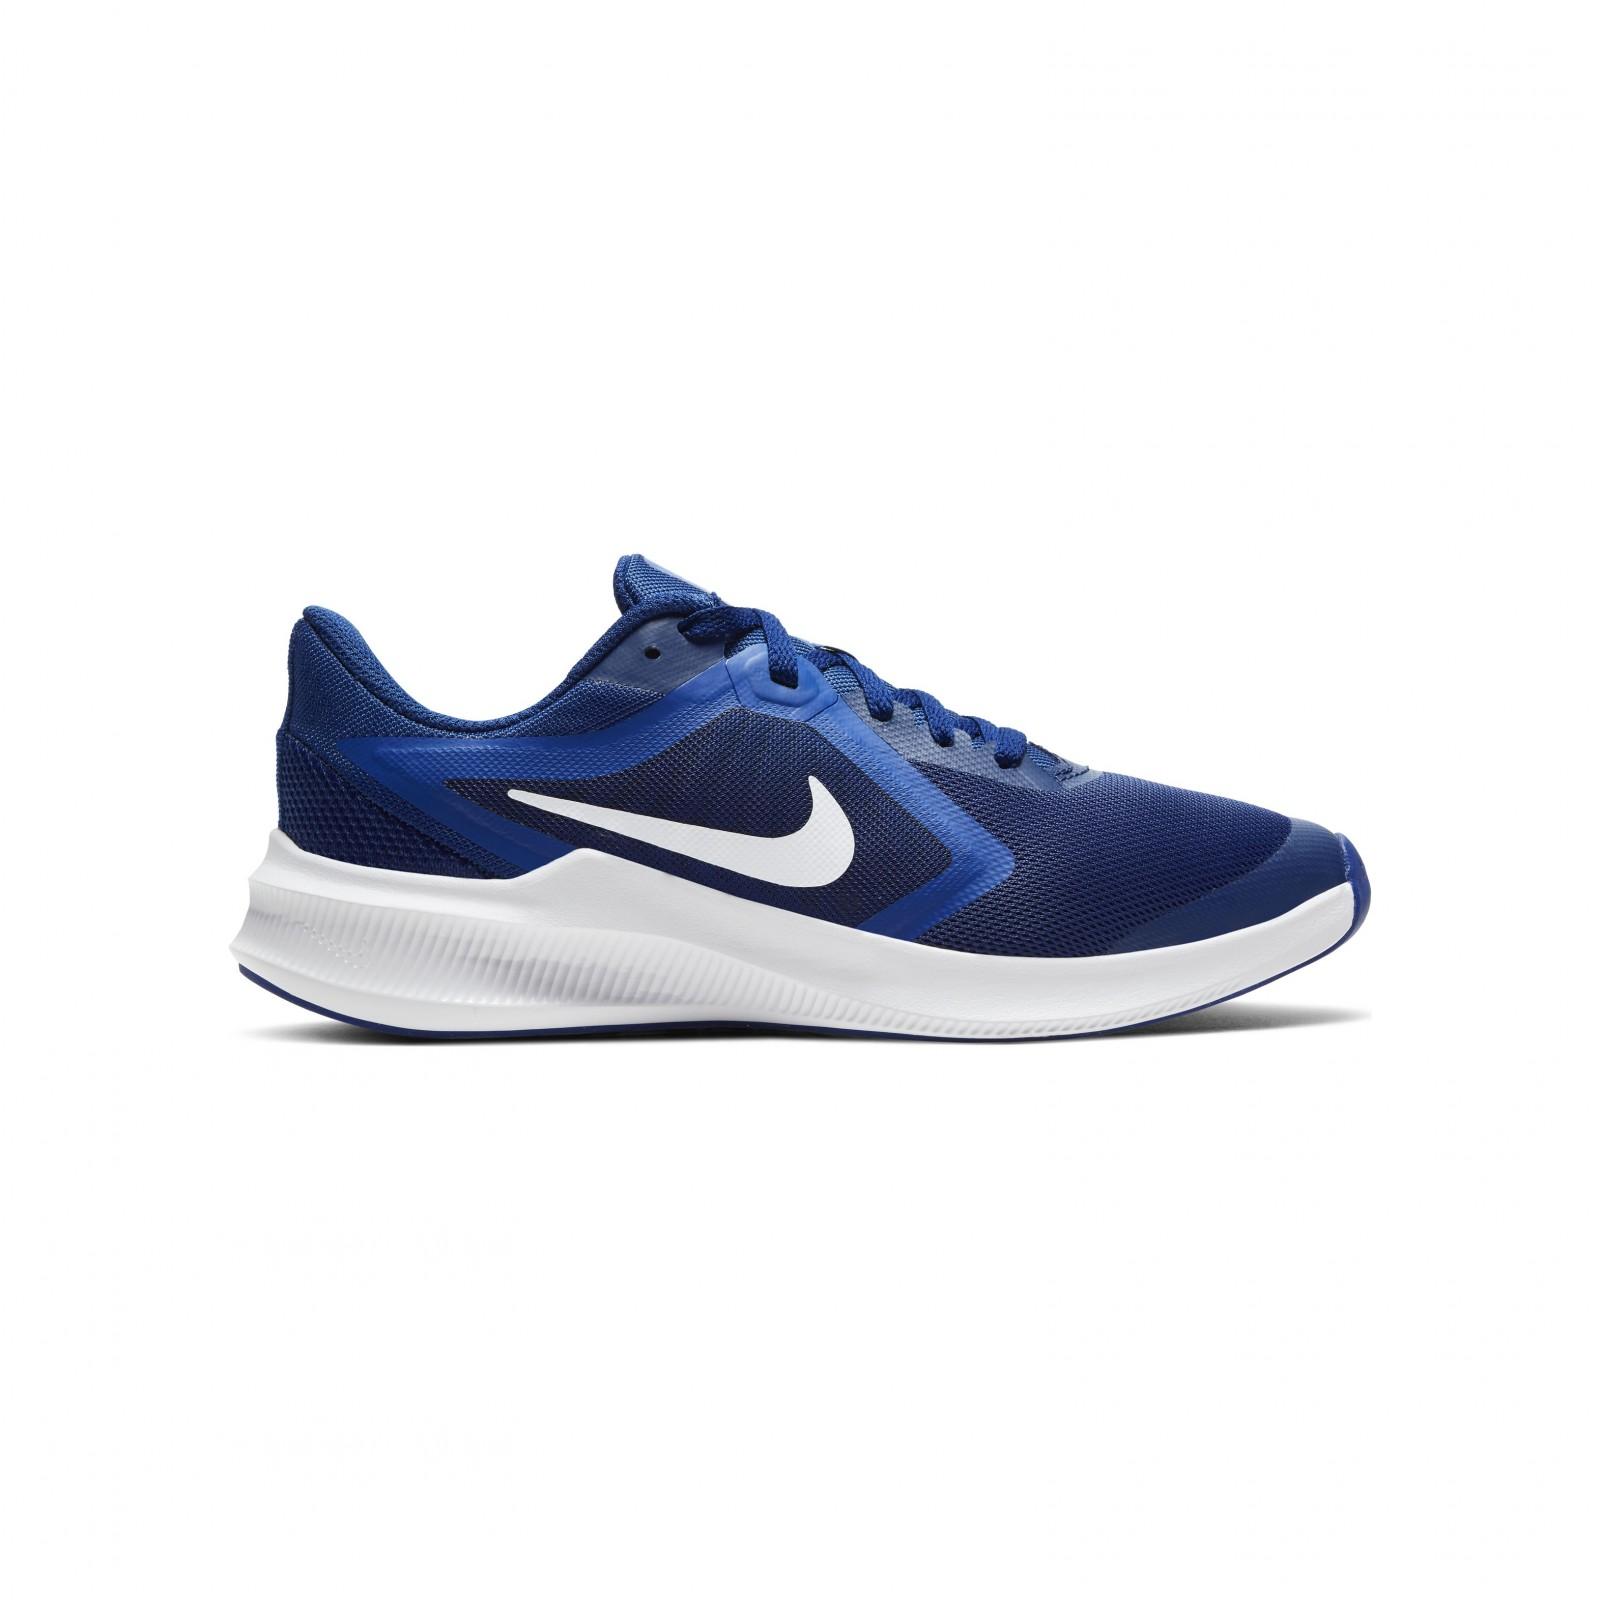 Nike downshifter 10 (gs) DEEP ROYAL BLUE/WHITE-HYPER BLUE